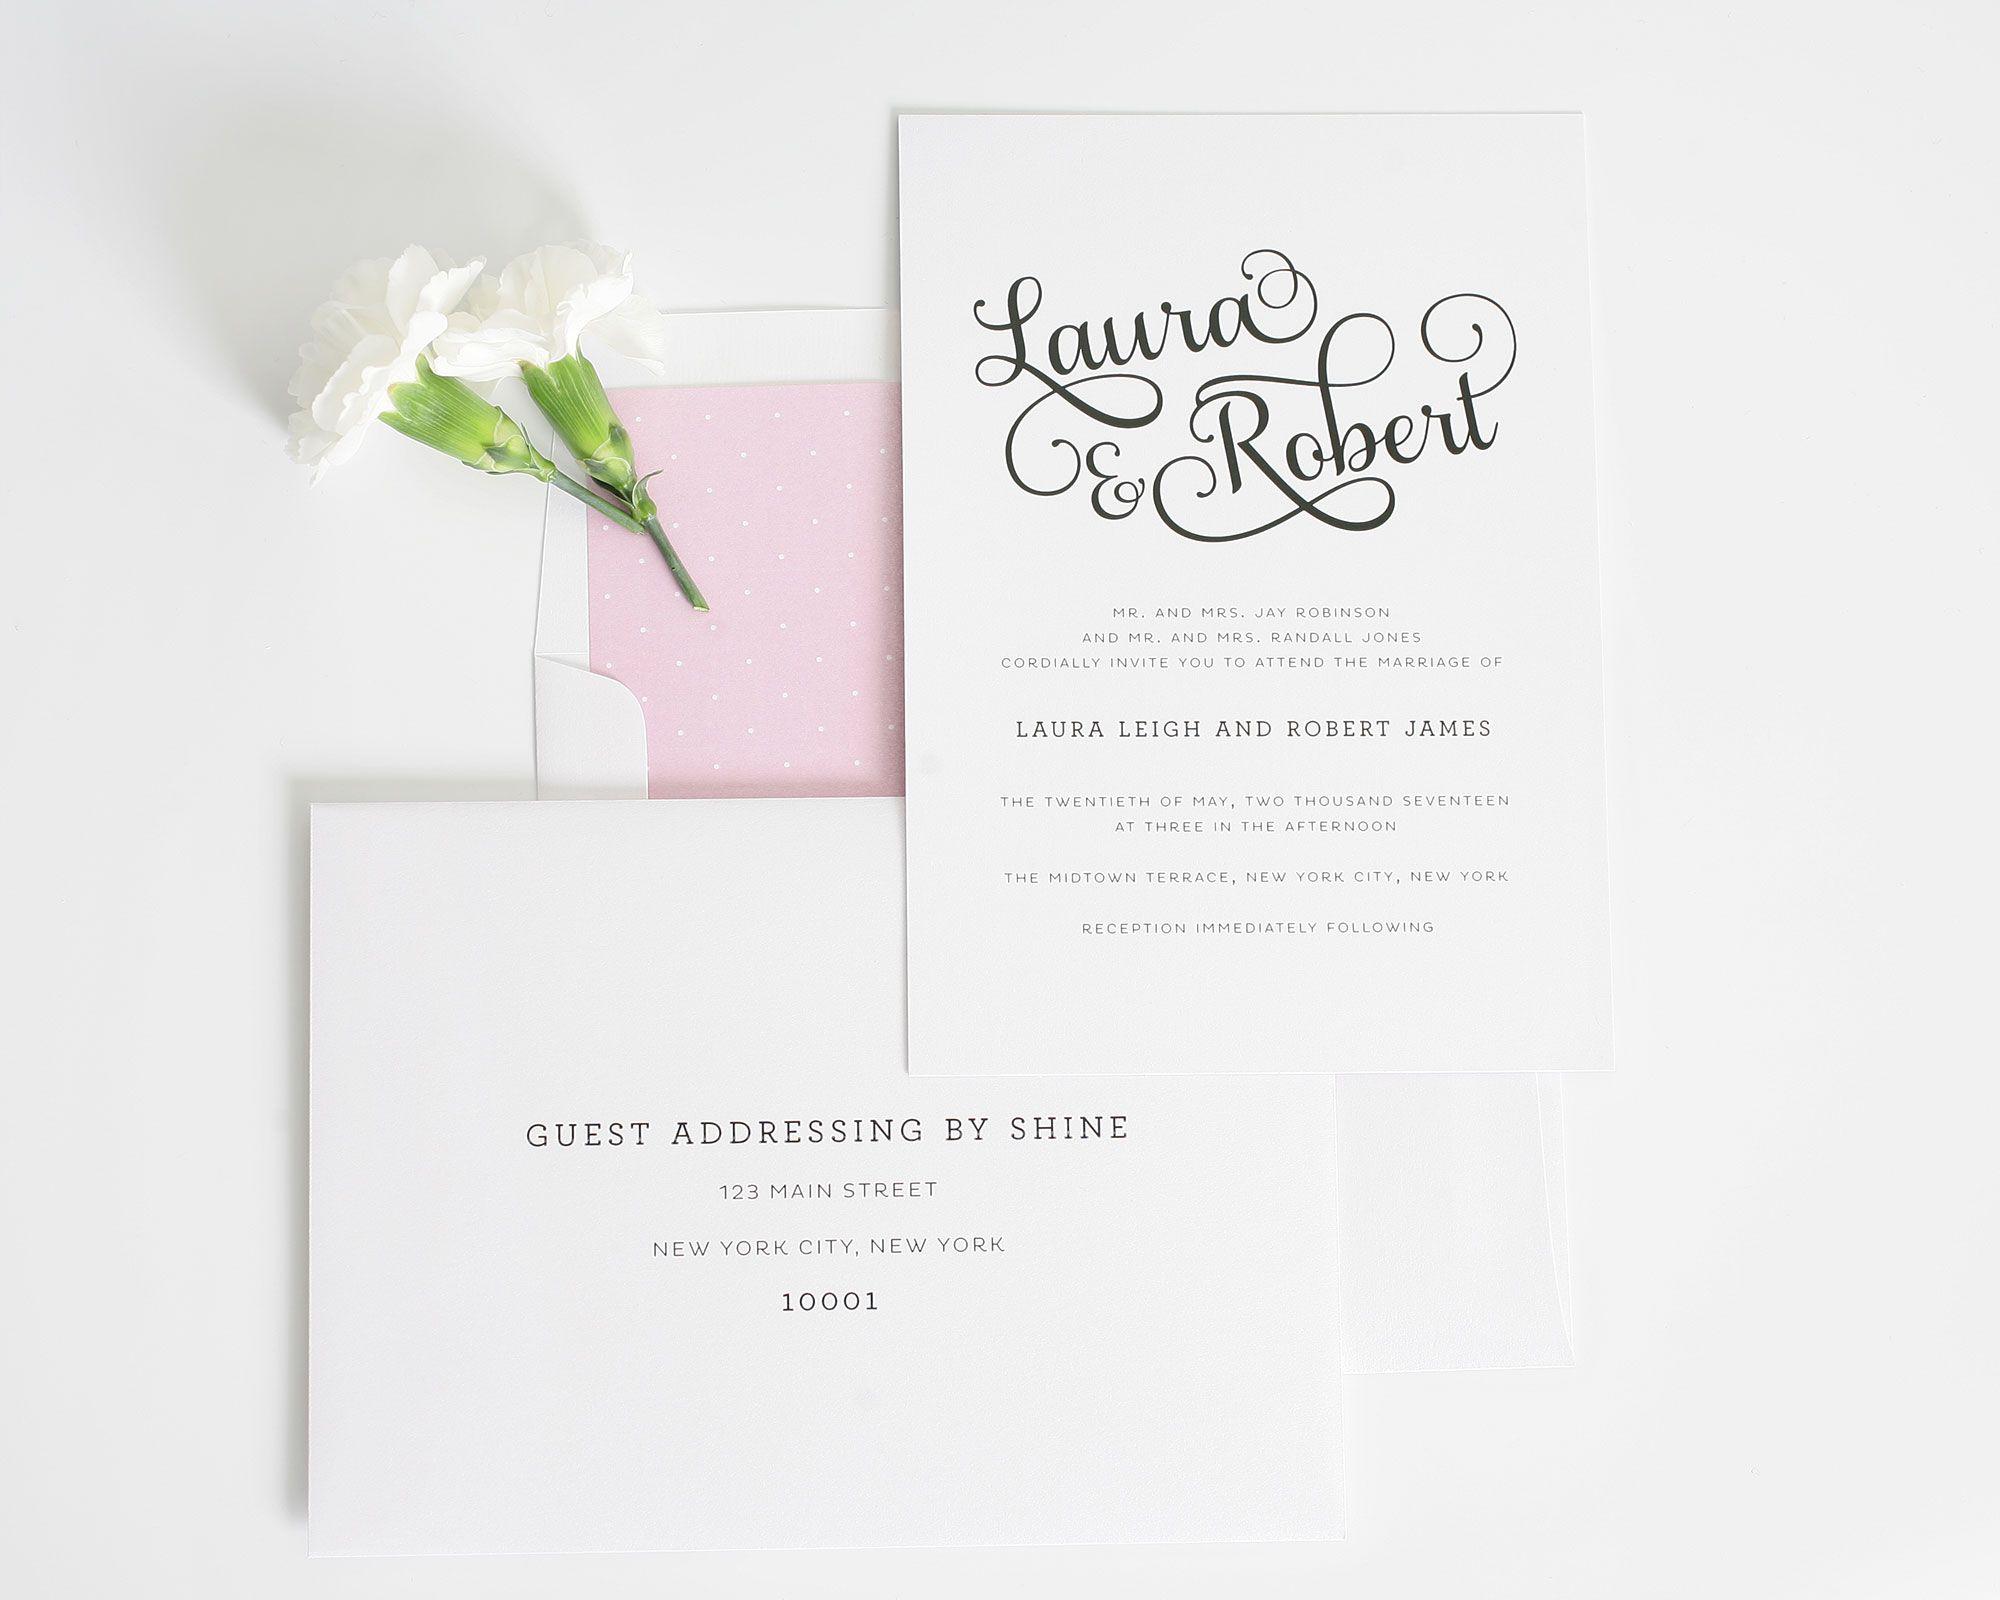 Sweet Romance Wedding Invitations   Shine wedding invitations ...